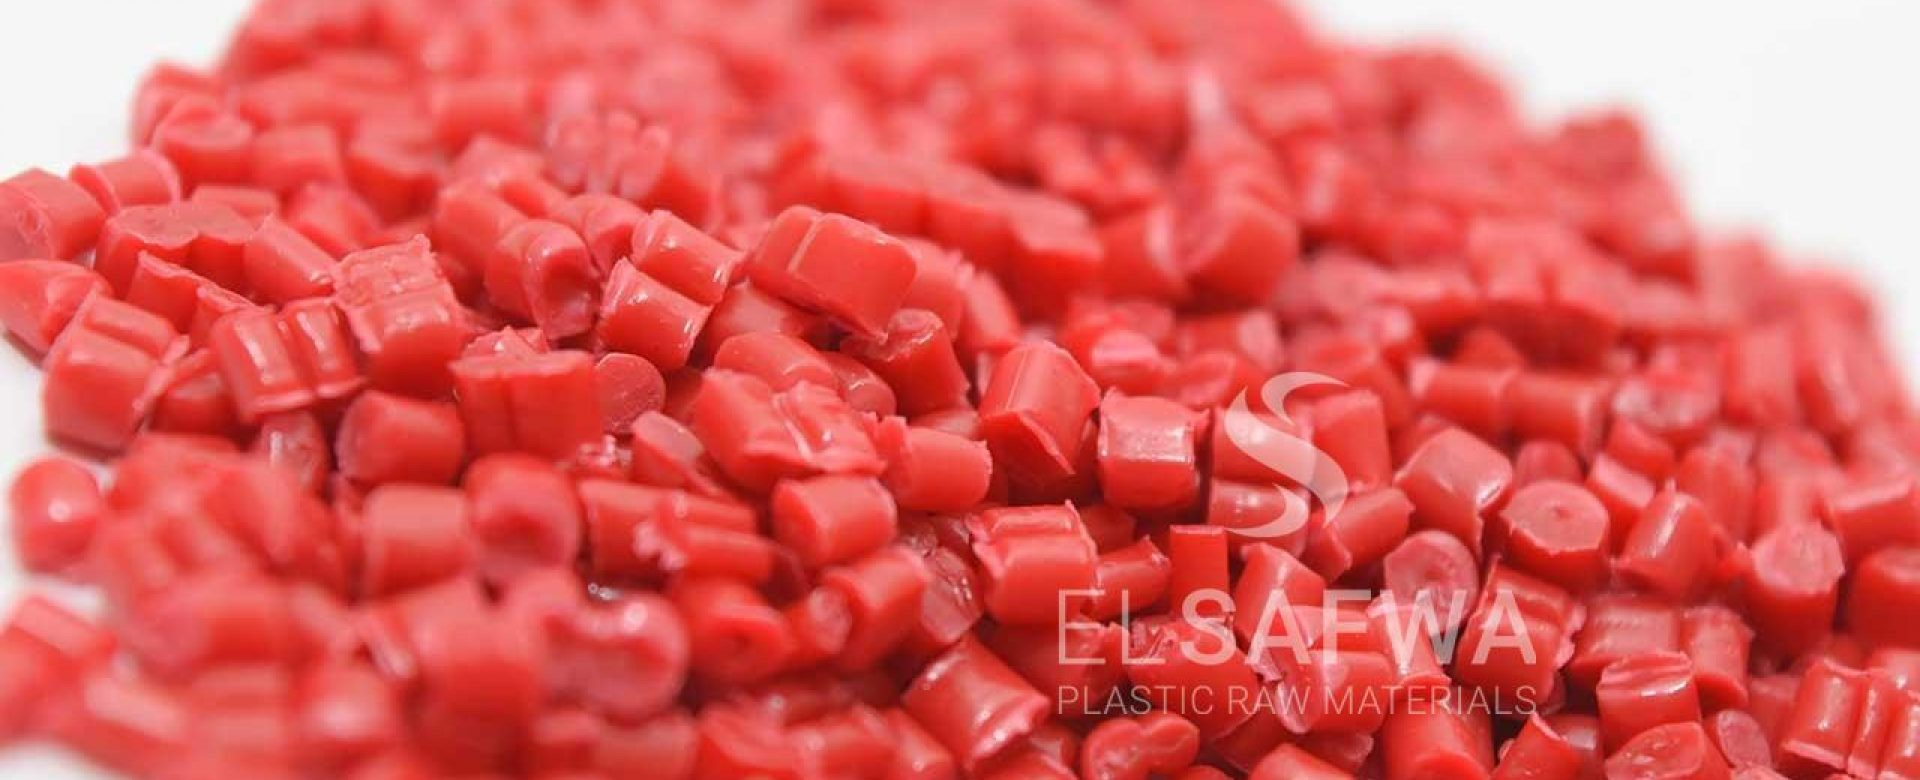 El-safwa-trade-plastic-trading-raw-materials-recycked-pp5